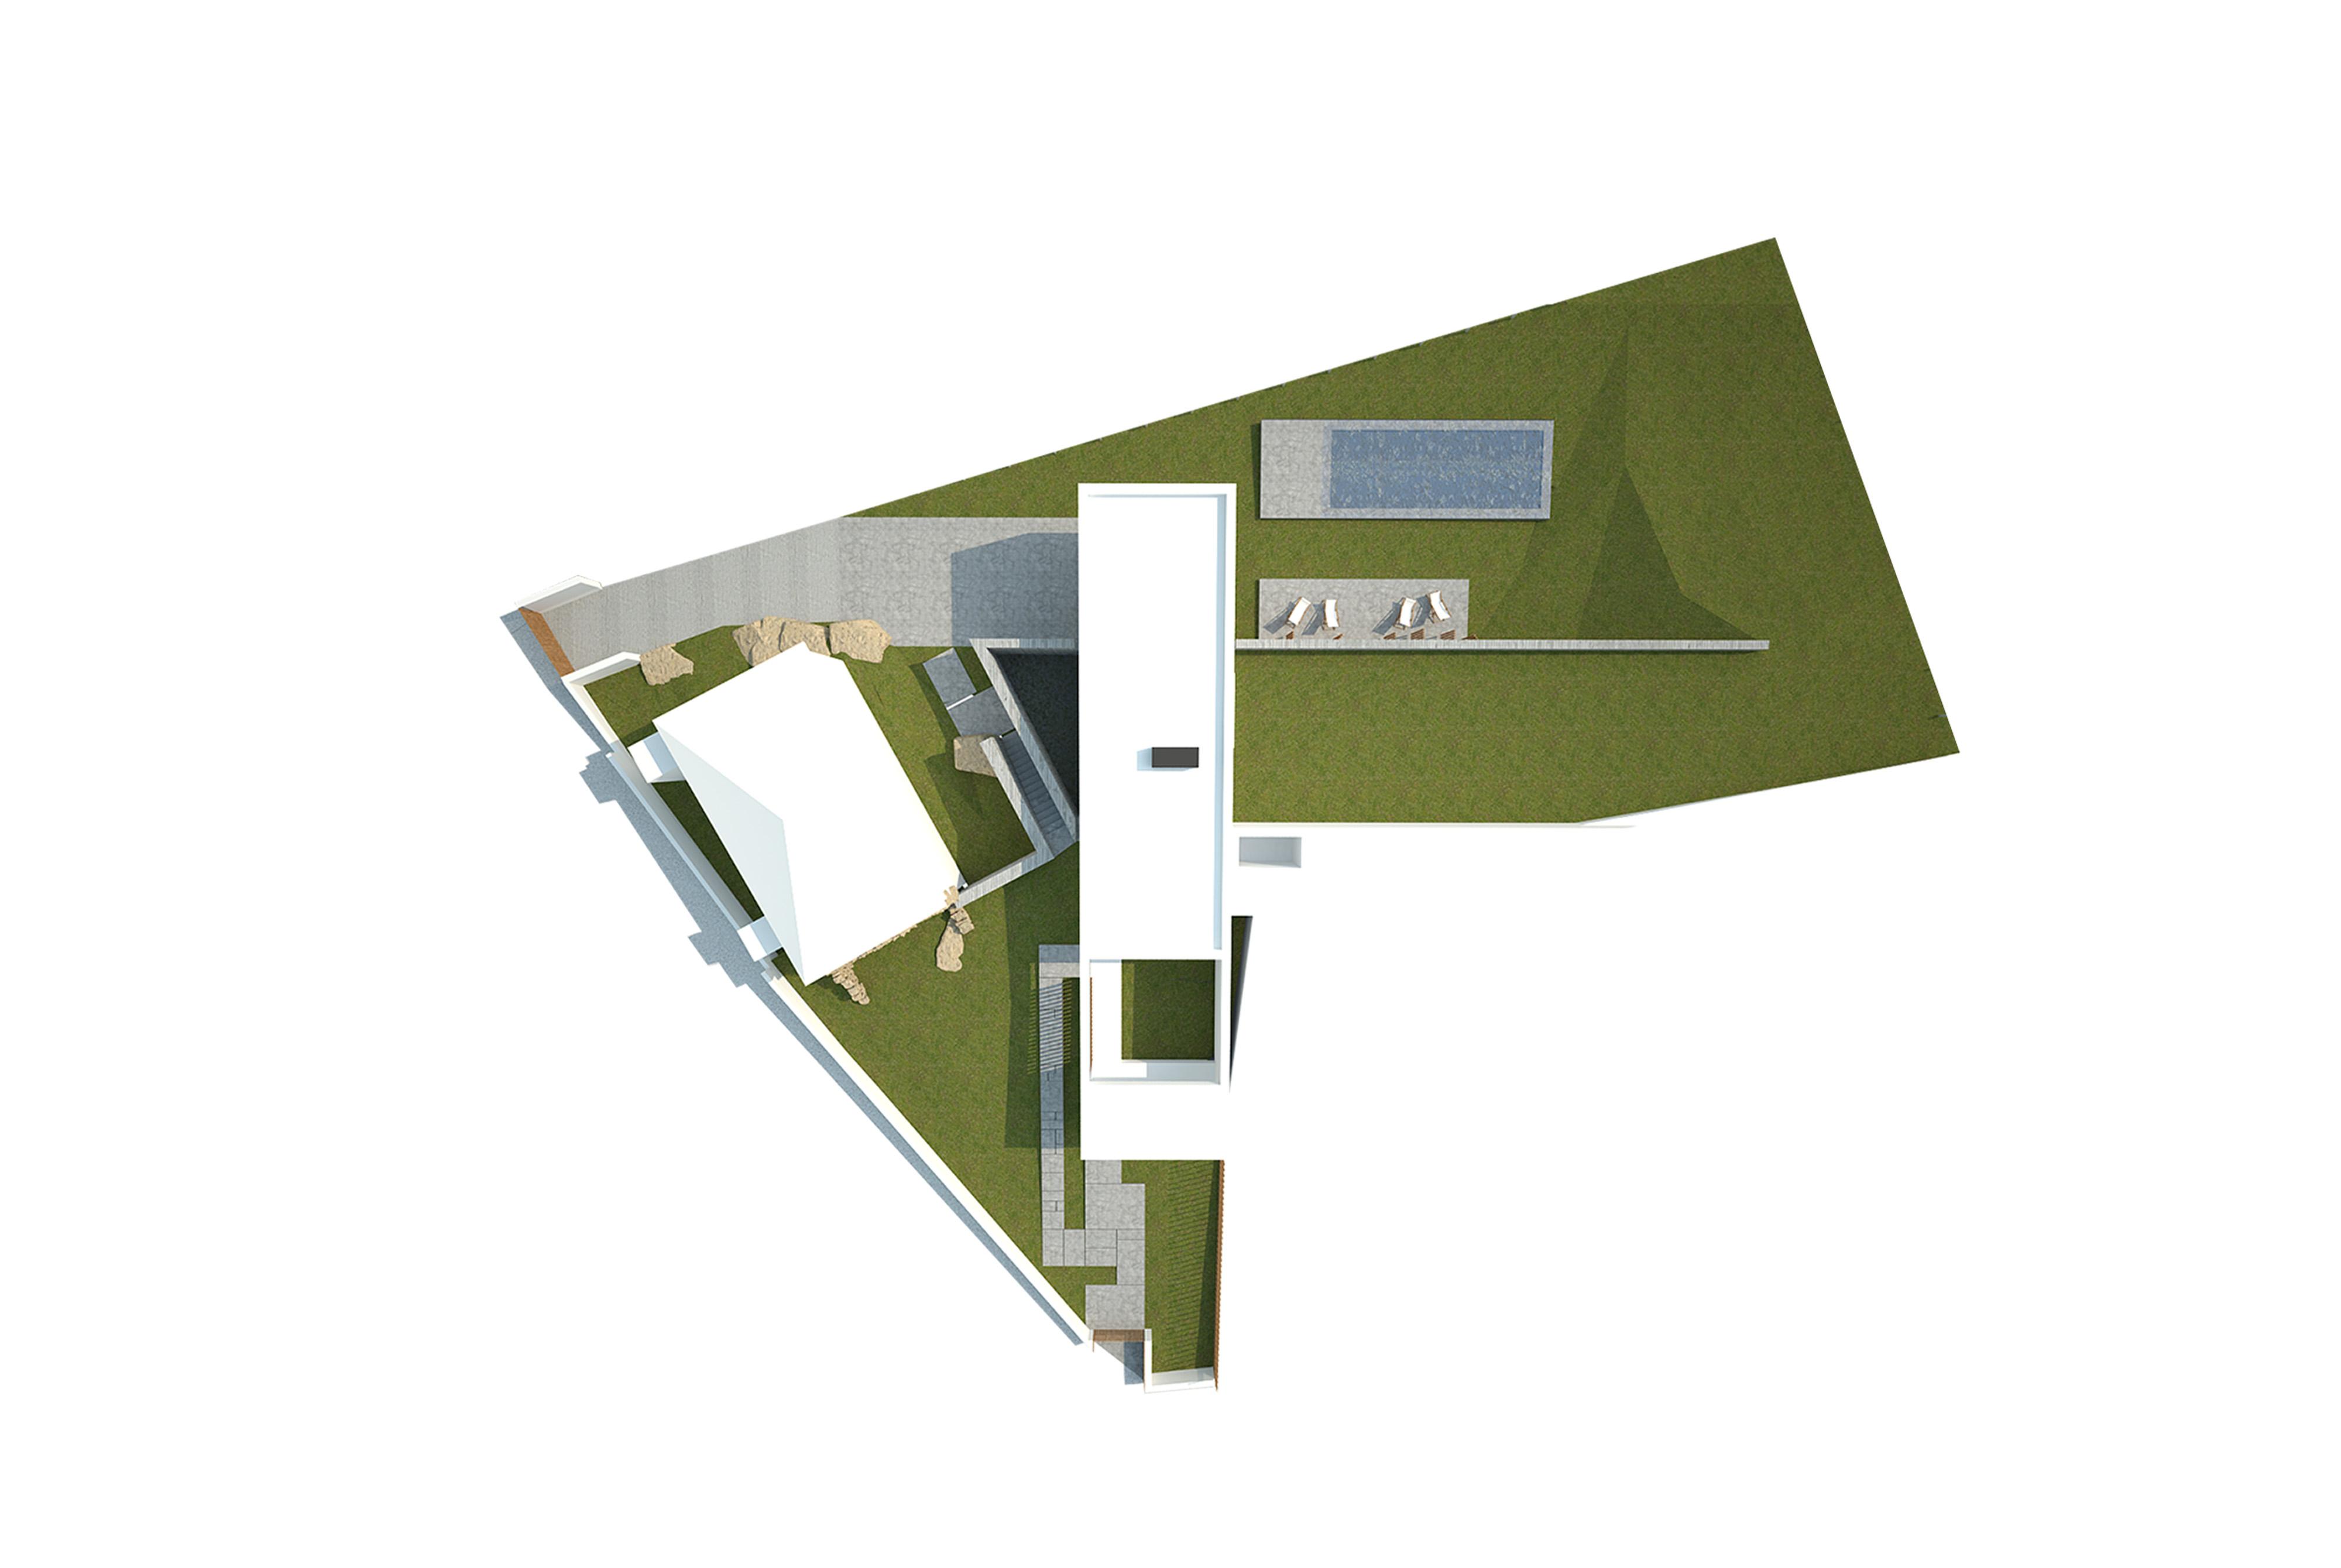 Arquitectura Arquitetura Arquitecto Arquiteto Sintra Lisboa Casa Moradia Architecture Architect Lisbon House Housing